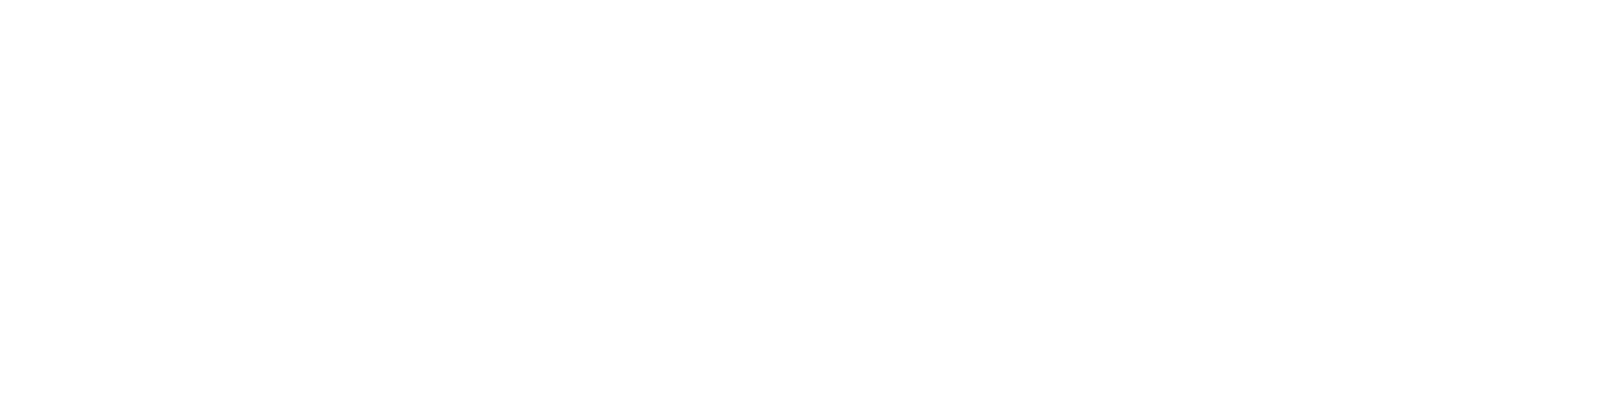 Bristile Roofing Tagline Logo RGB Reversed